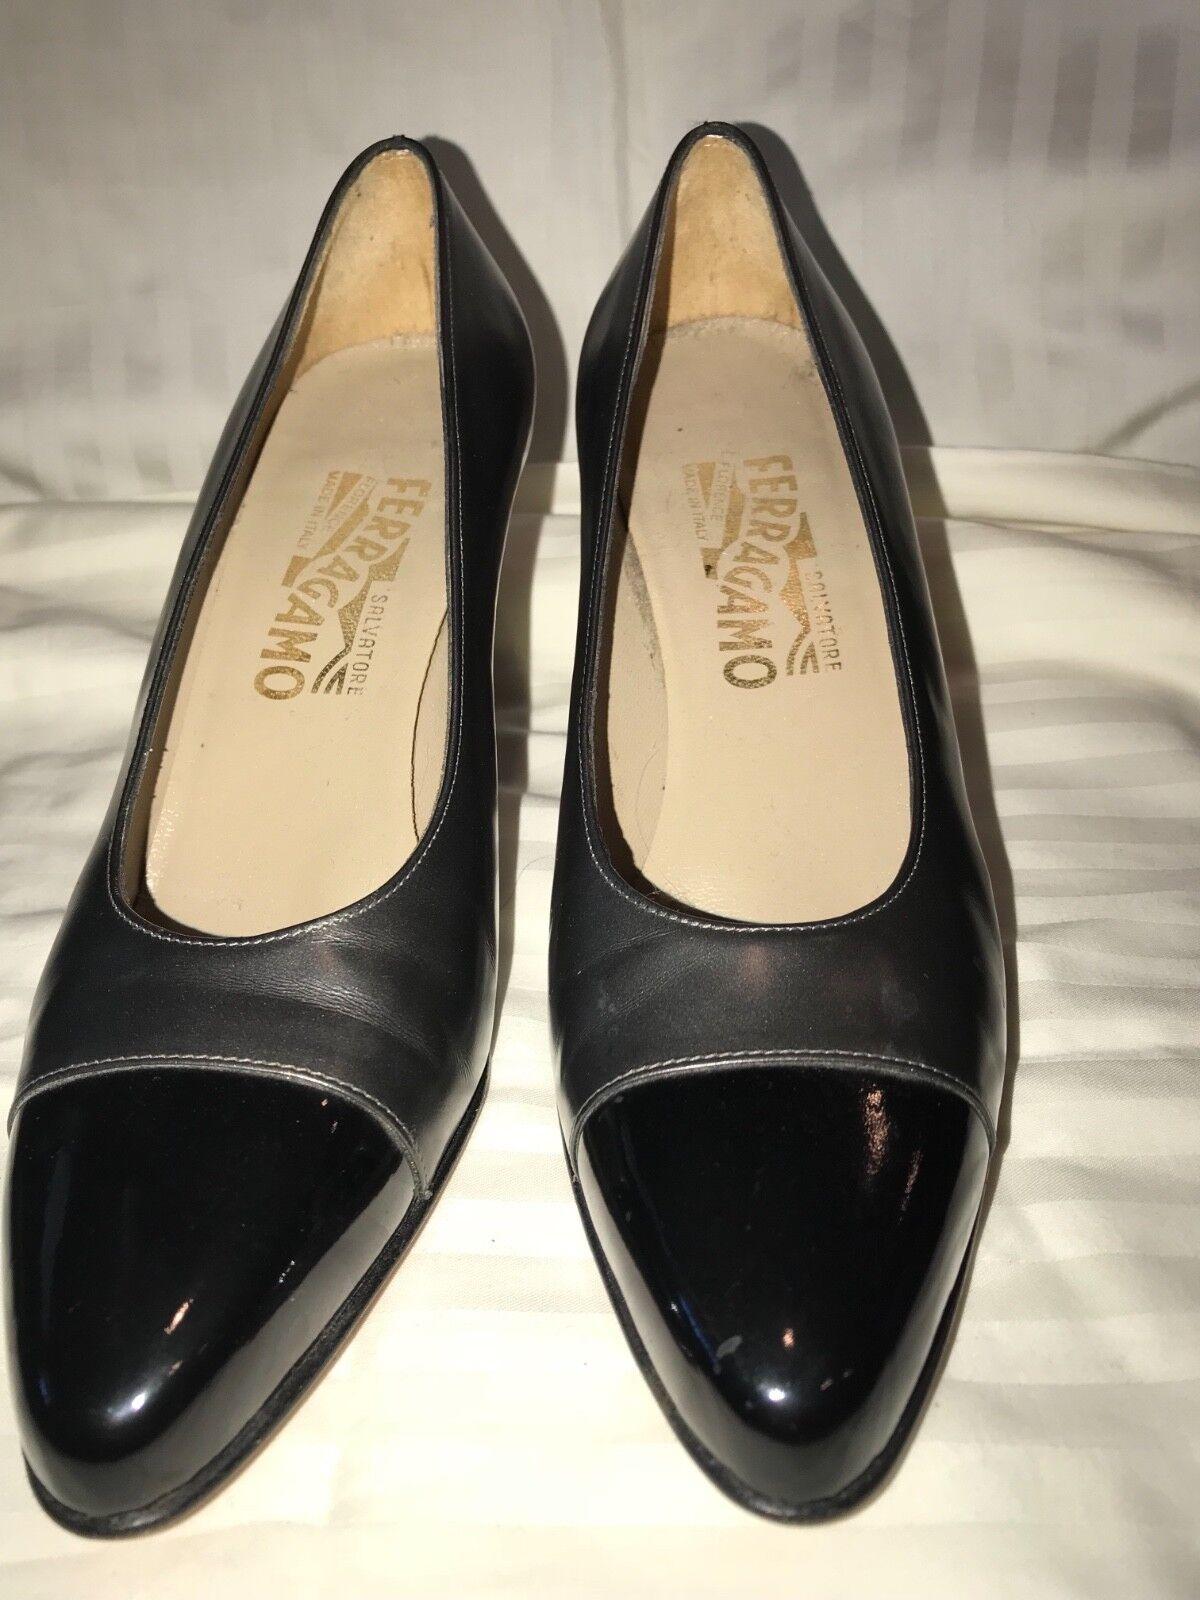 Woman's Ferragamo patent Leder toe and gunmetal gray pumps Größe 7